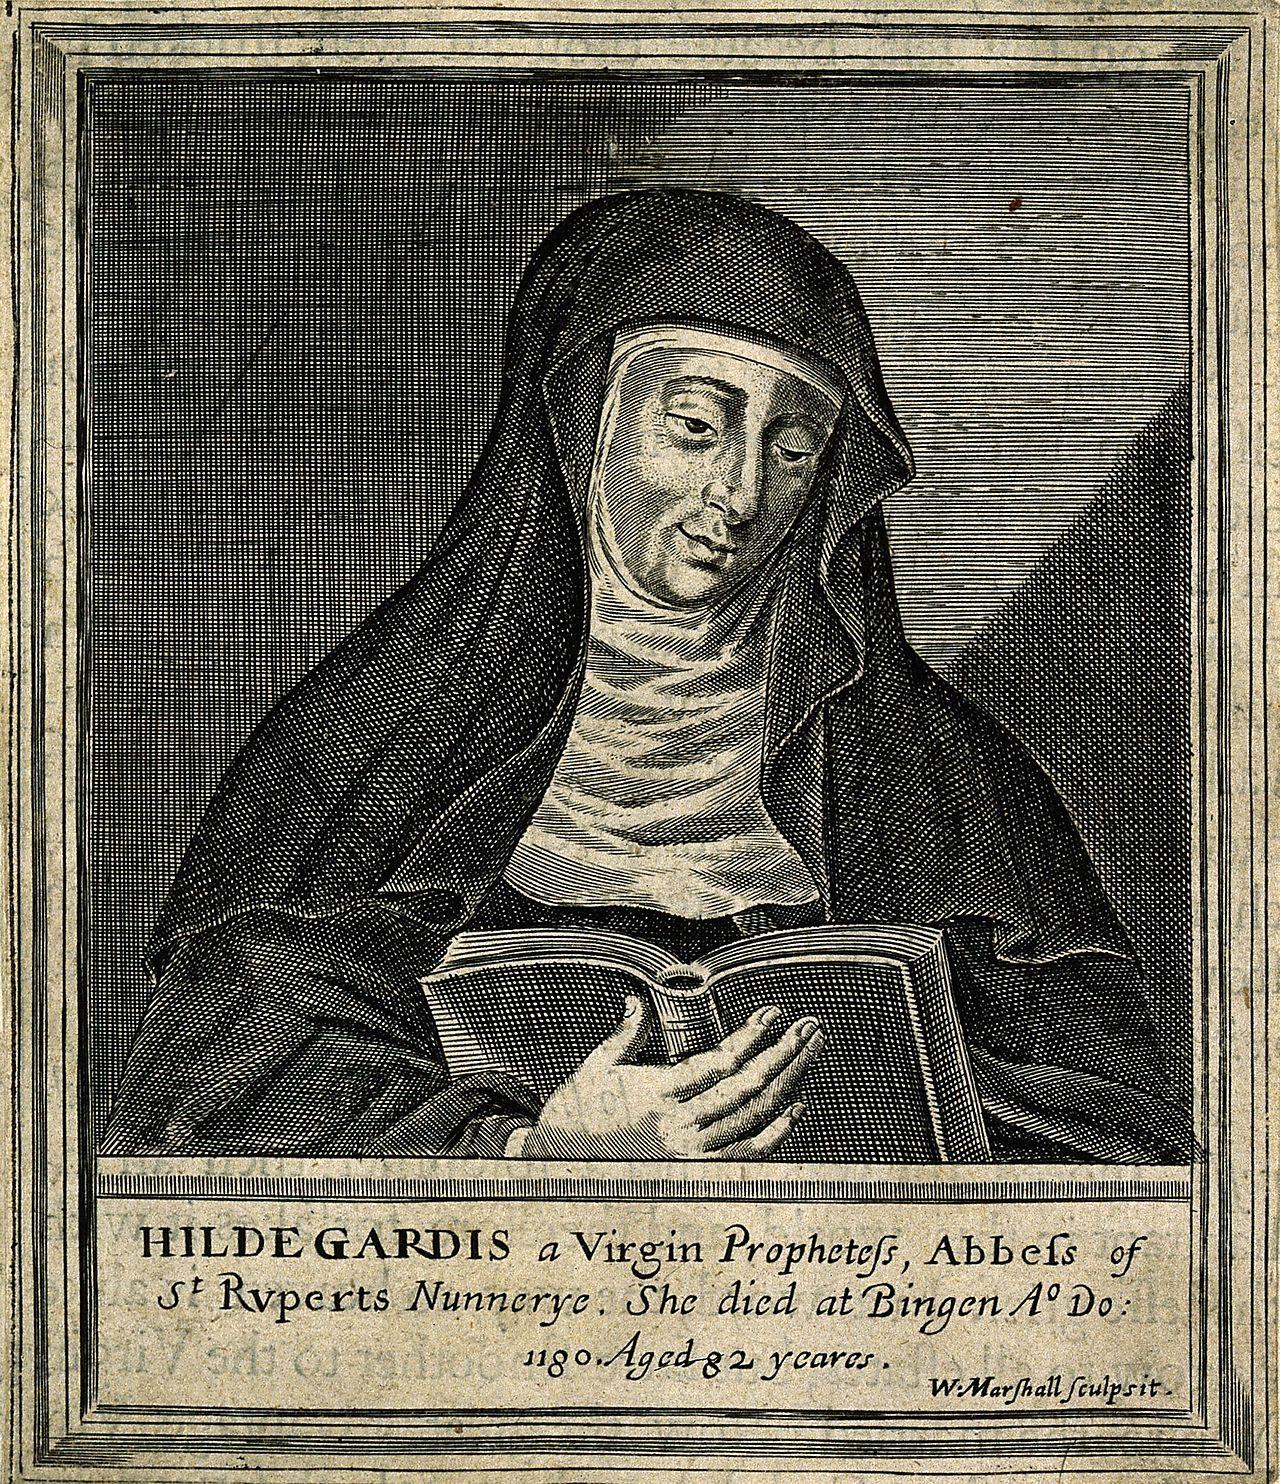 The accomplished St. Hildegard of Bingen